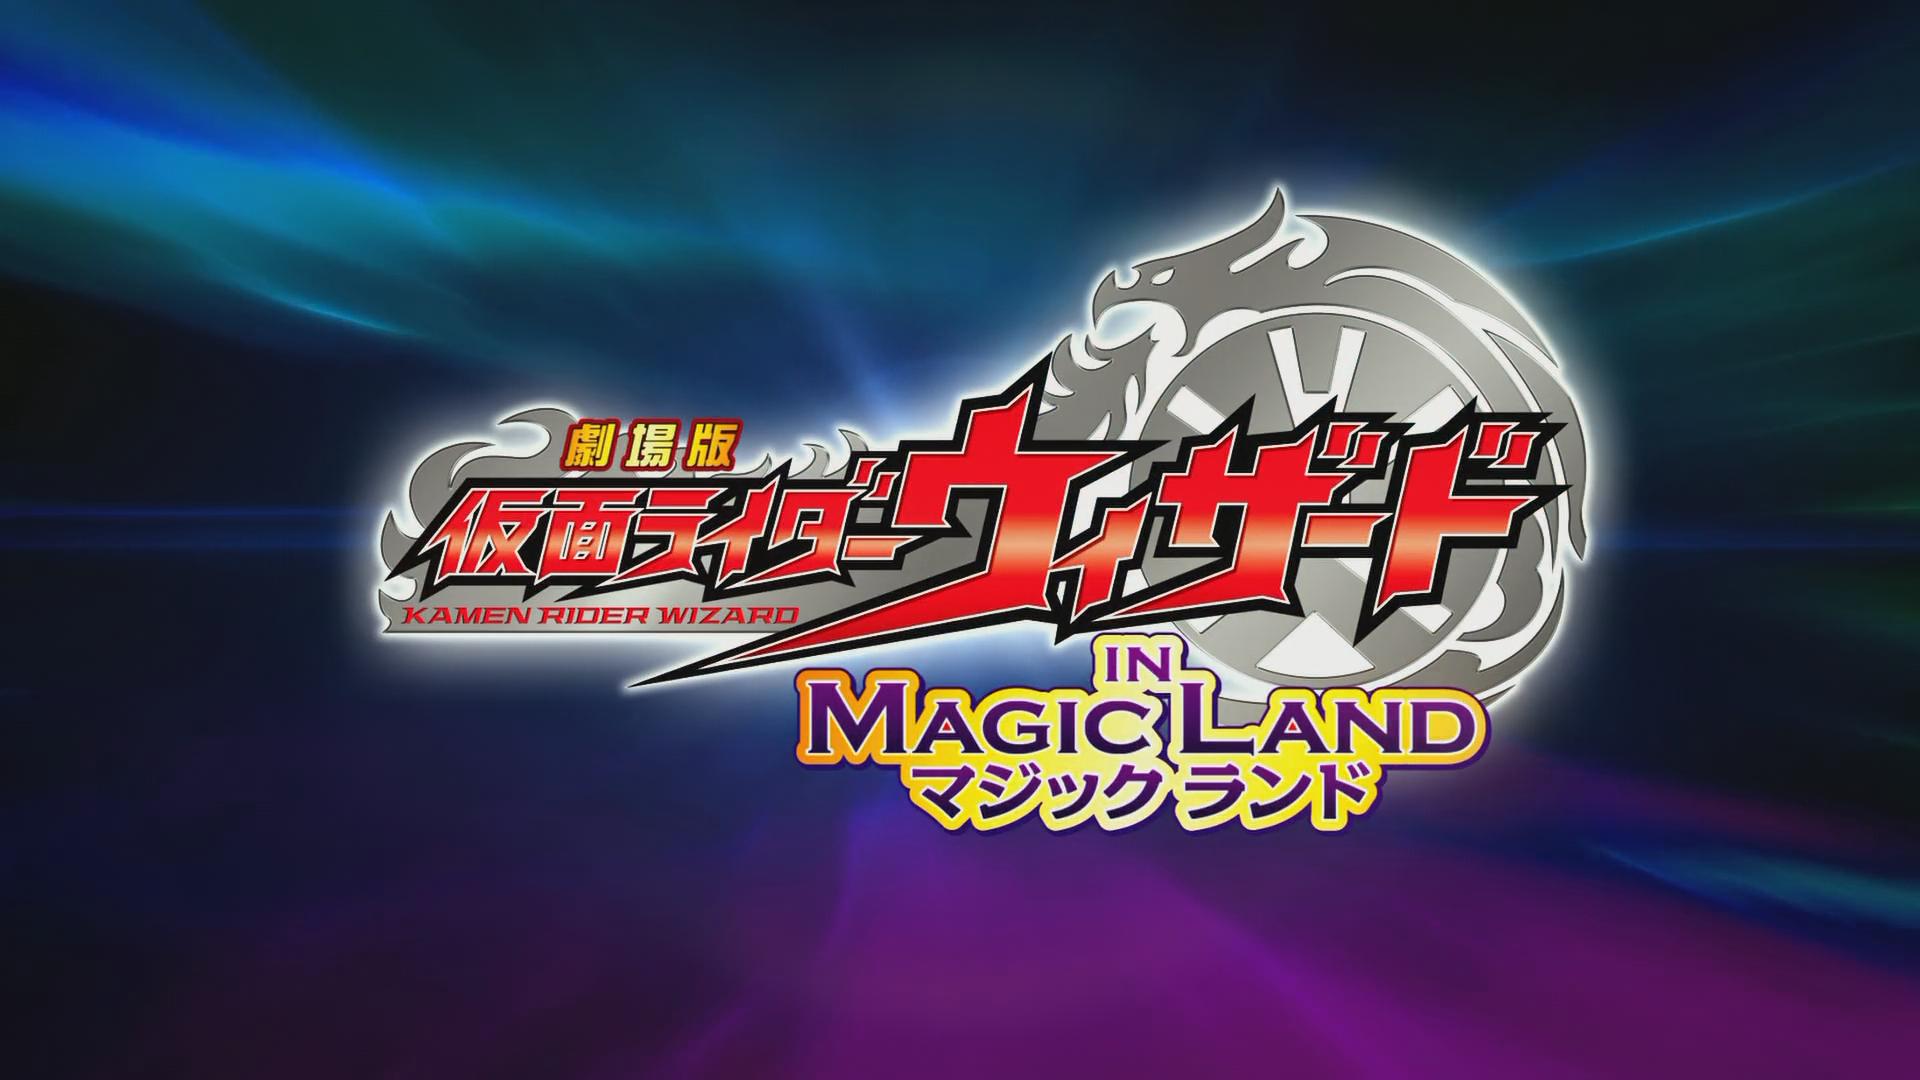 In Magic Land Title